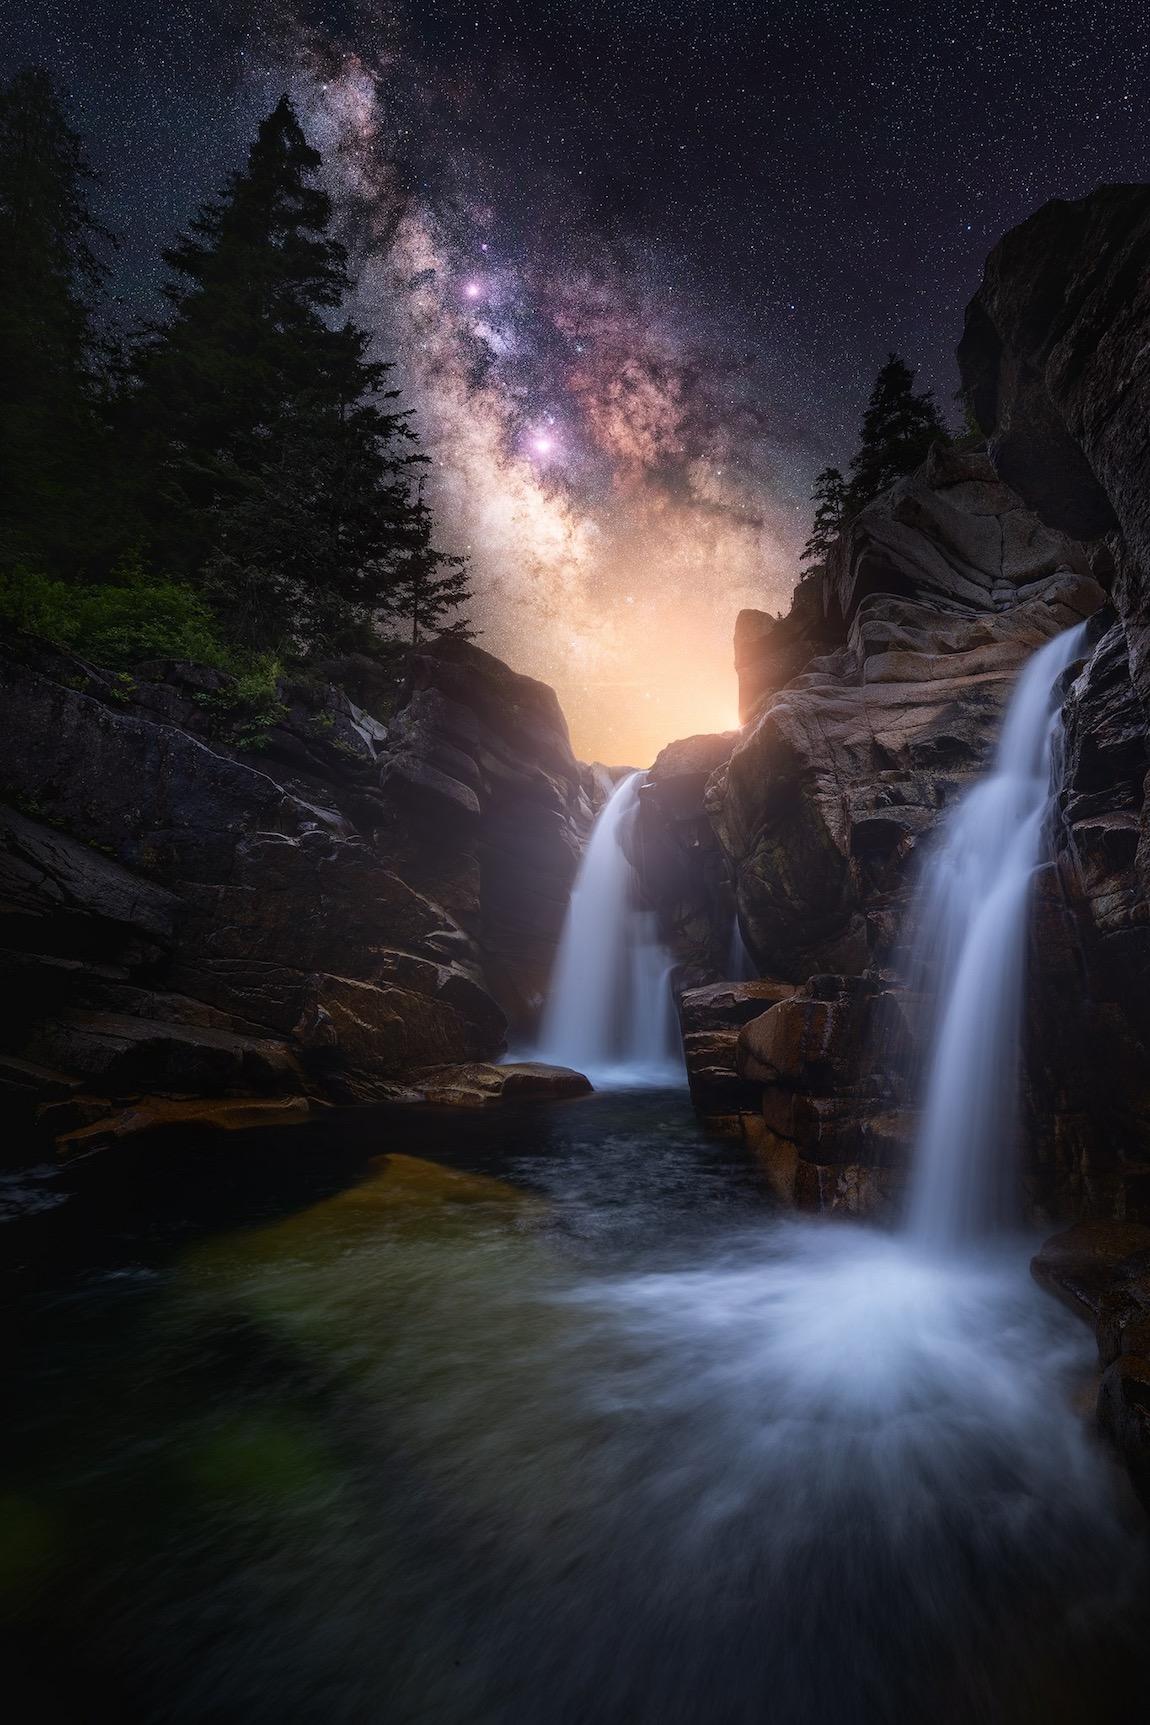 night-landscape-photography-10